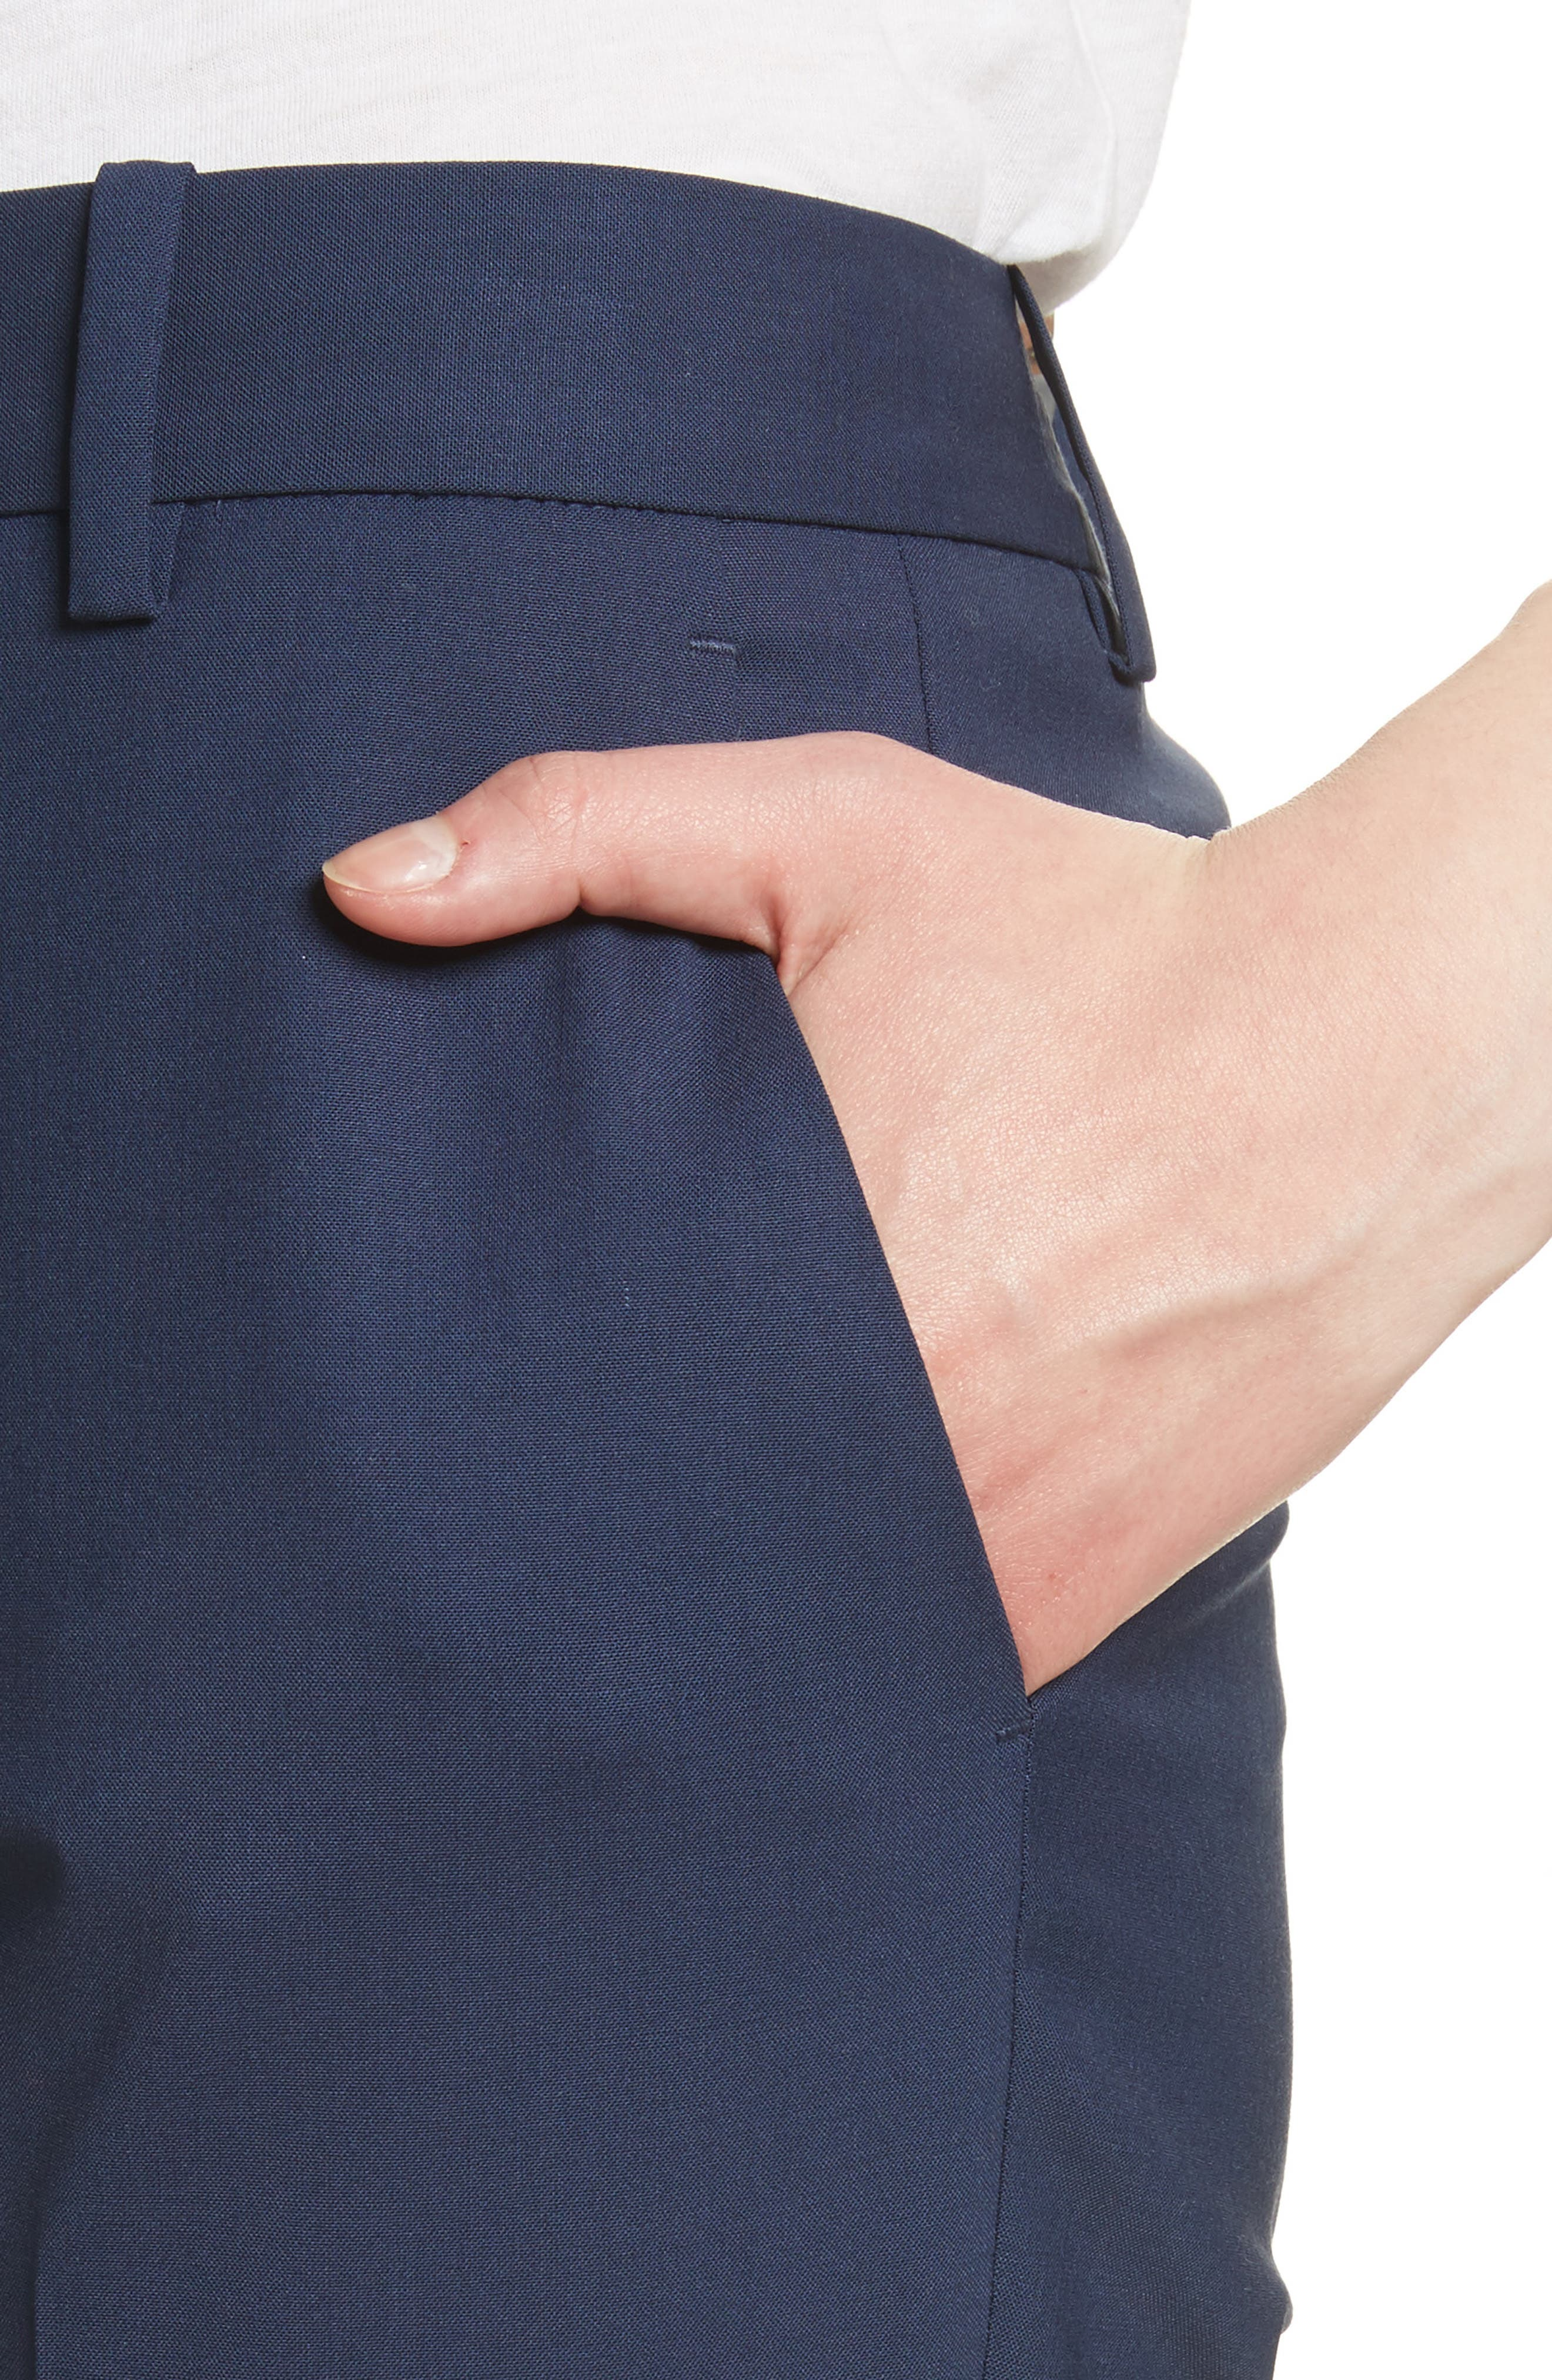 Treeca 2 Good Wool Crop Suit Pants,                             Alternate thumbnail 4, color,                             Sea Blue